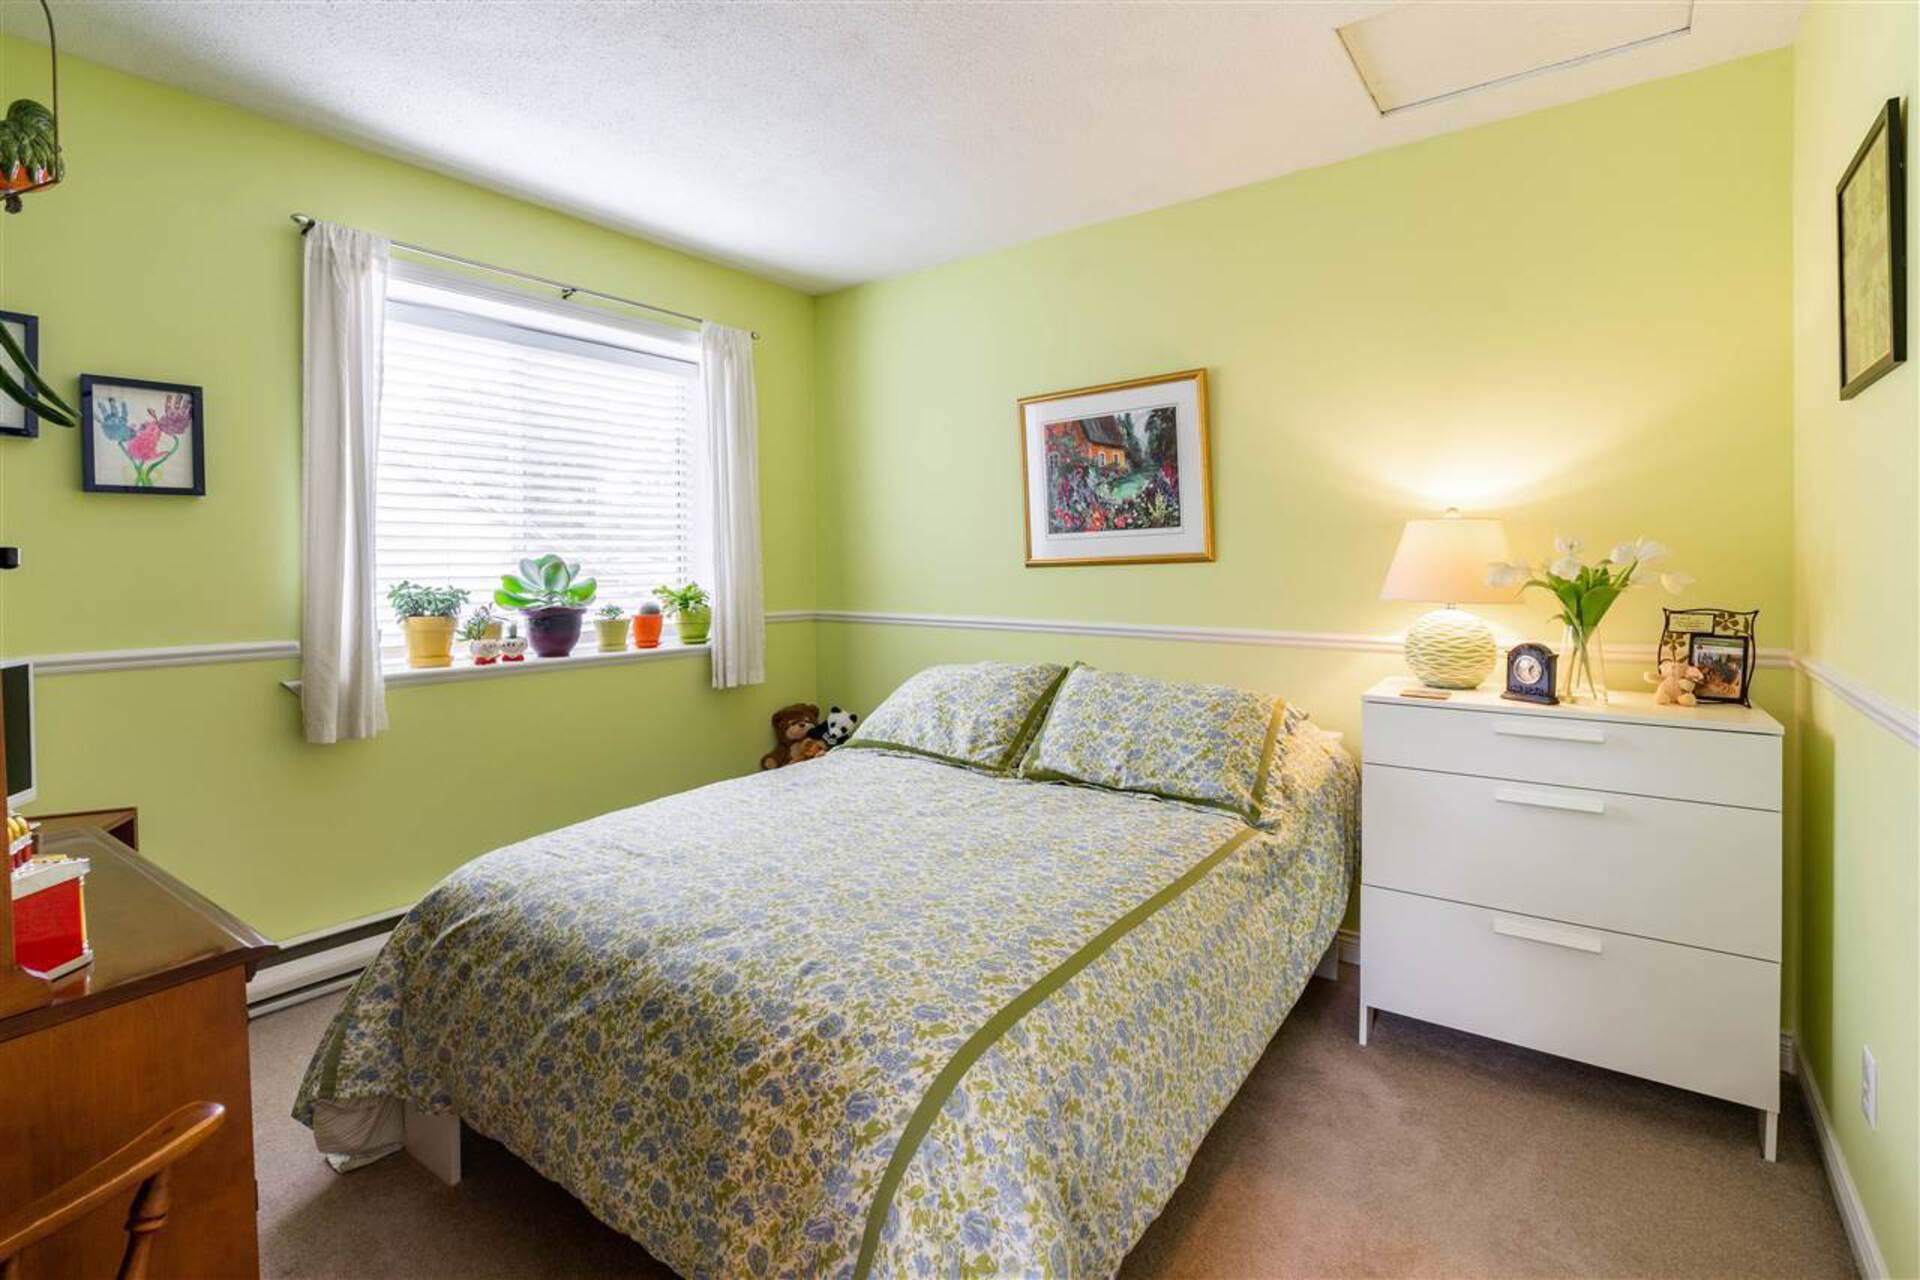 1318-brunette-avenue-maillardville-coquitlam-22 of 1 - 1318 Brunette Avenue, Maillardville, Coquitlam